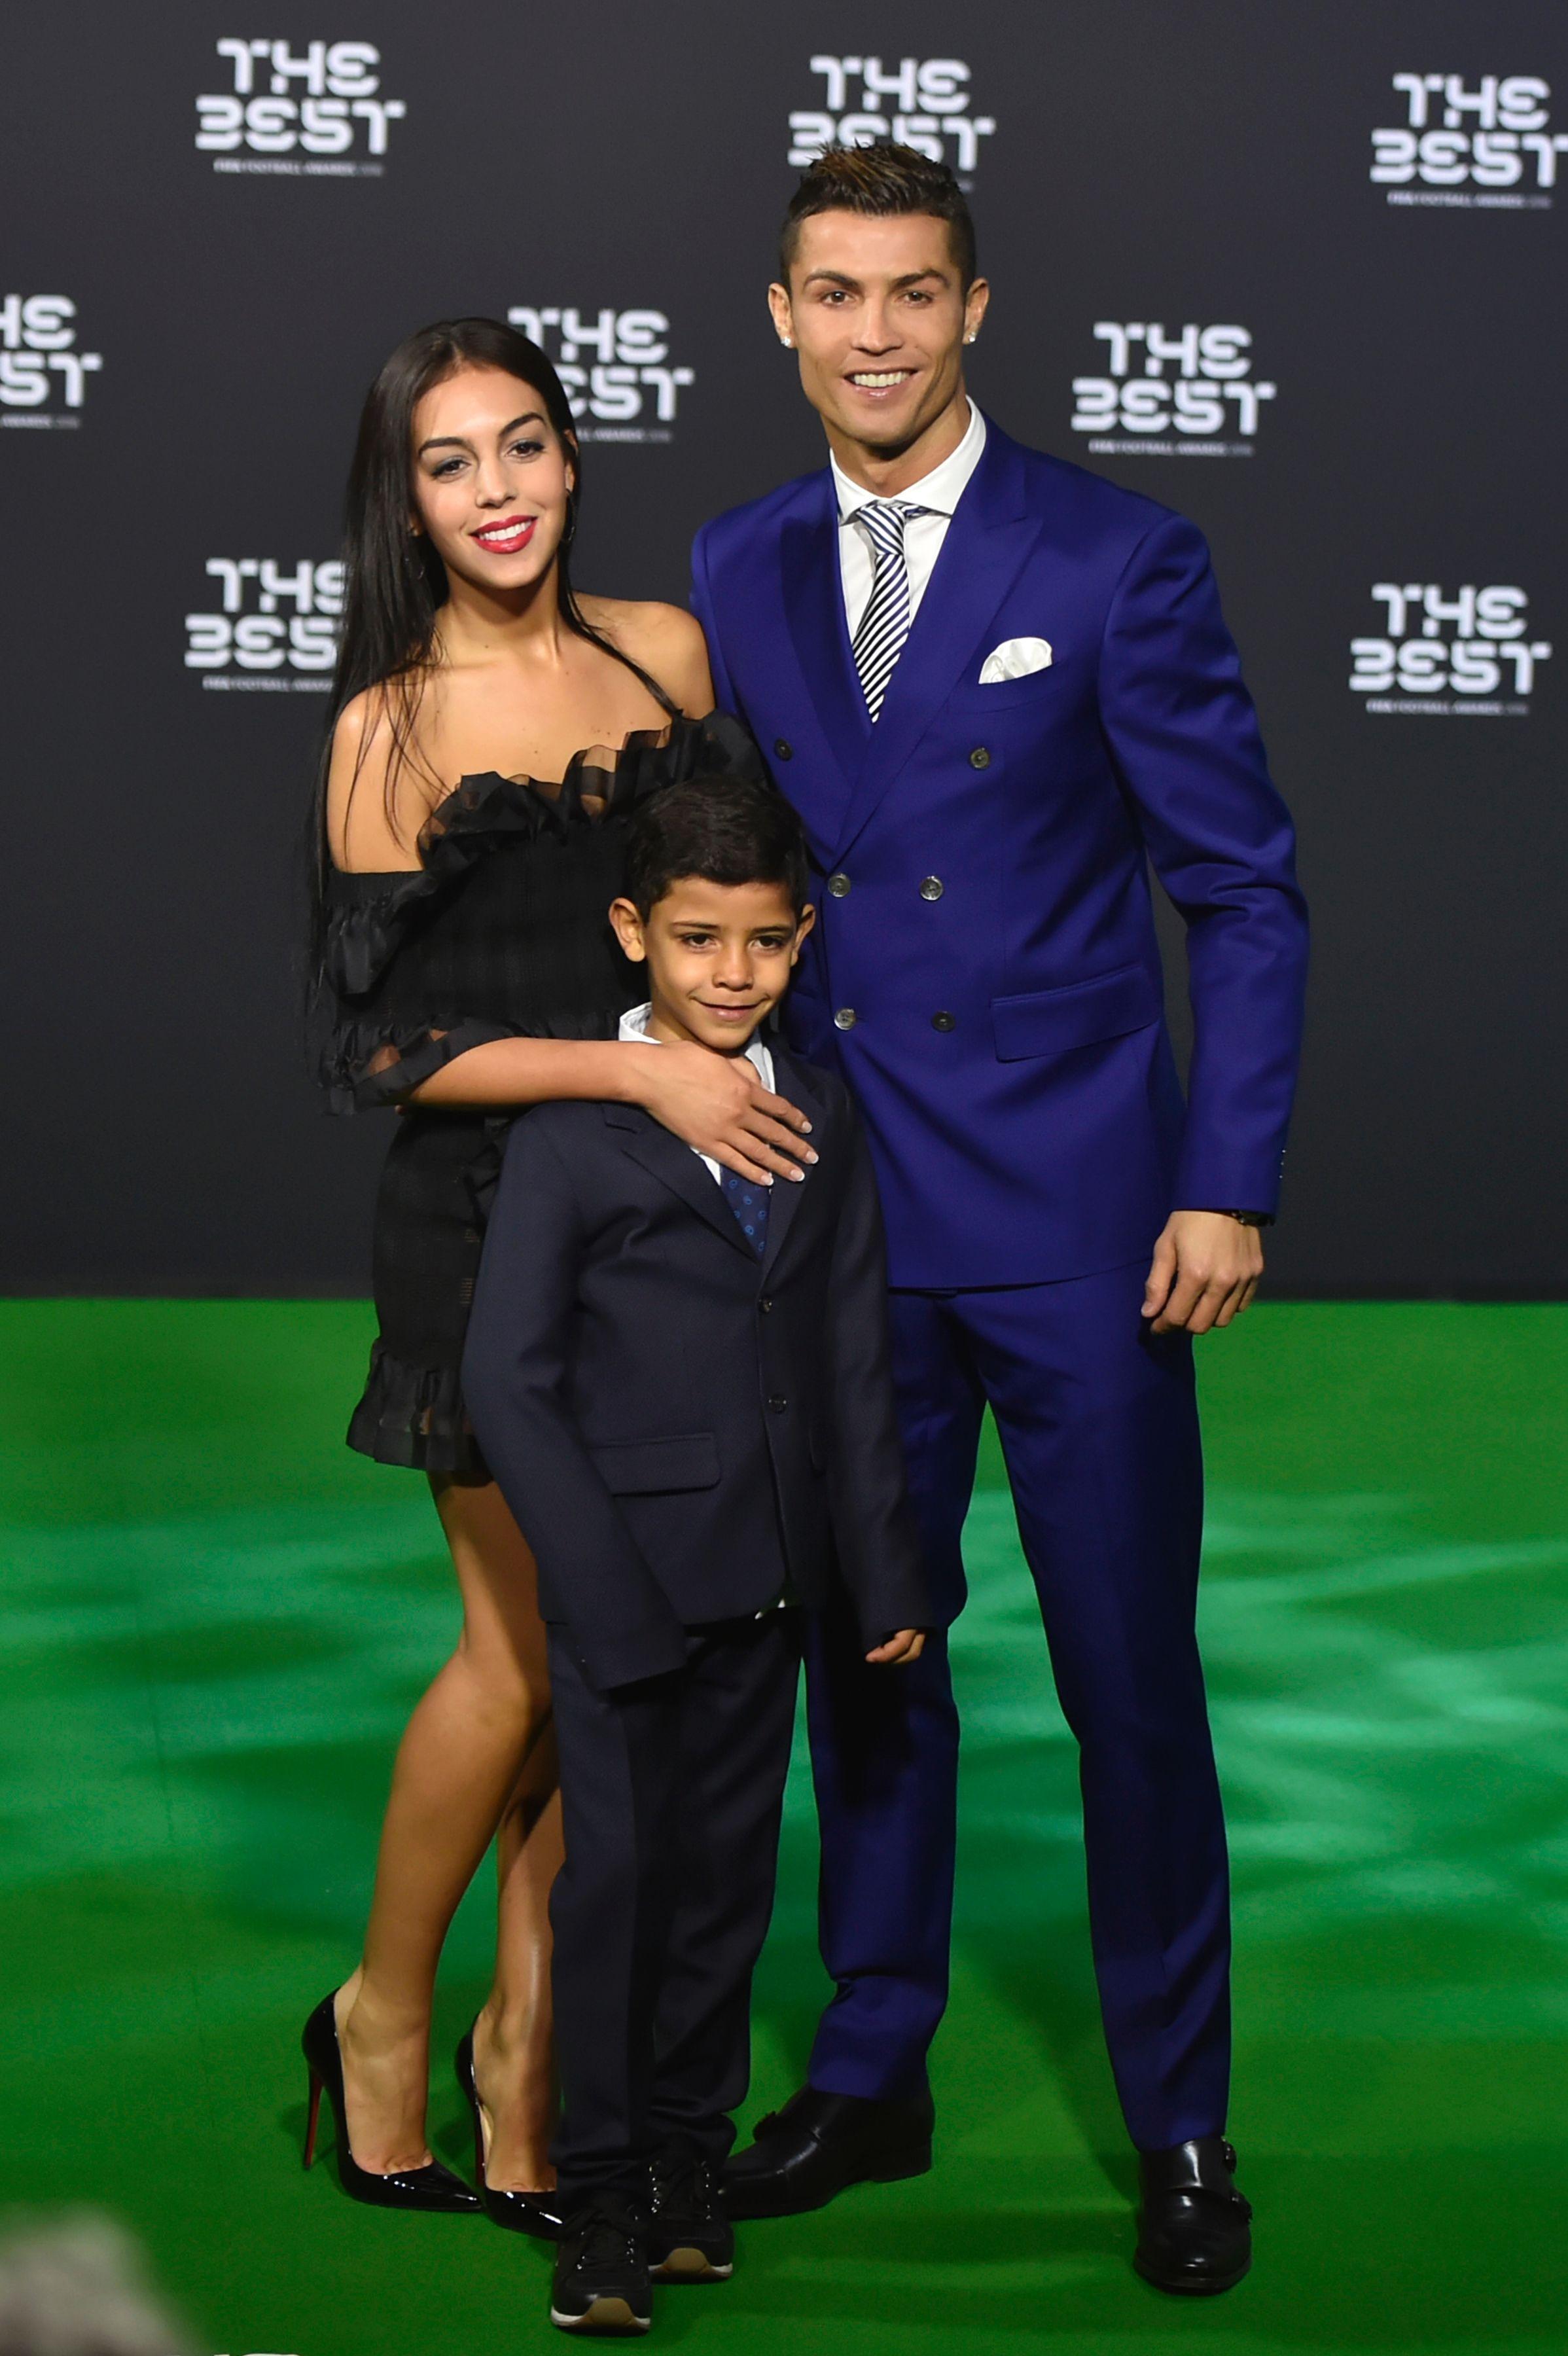 Cristiano Ronaldo posing with his partner Georgina Rodriguez and his son Cristiano Ronaldo J